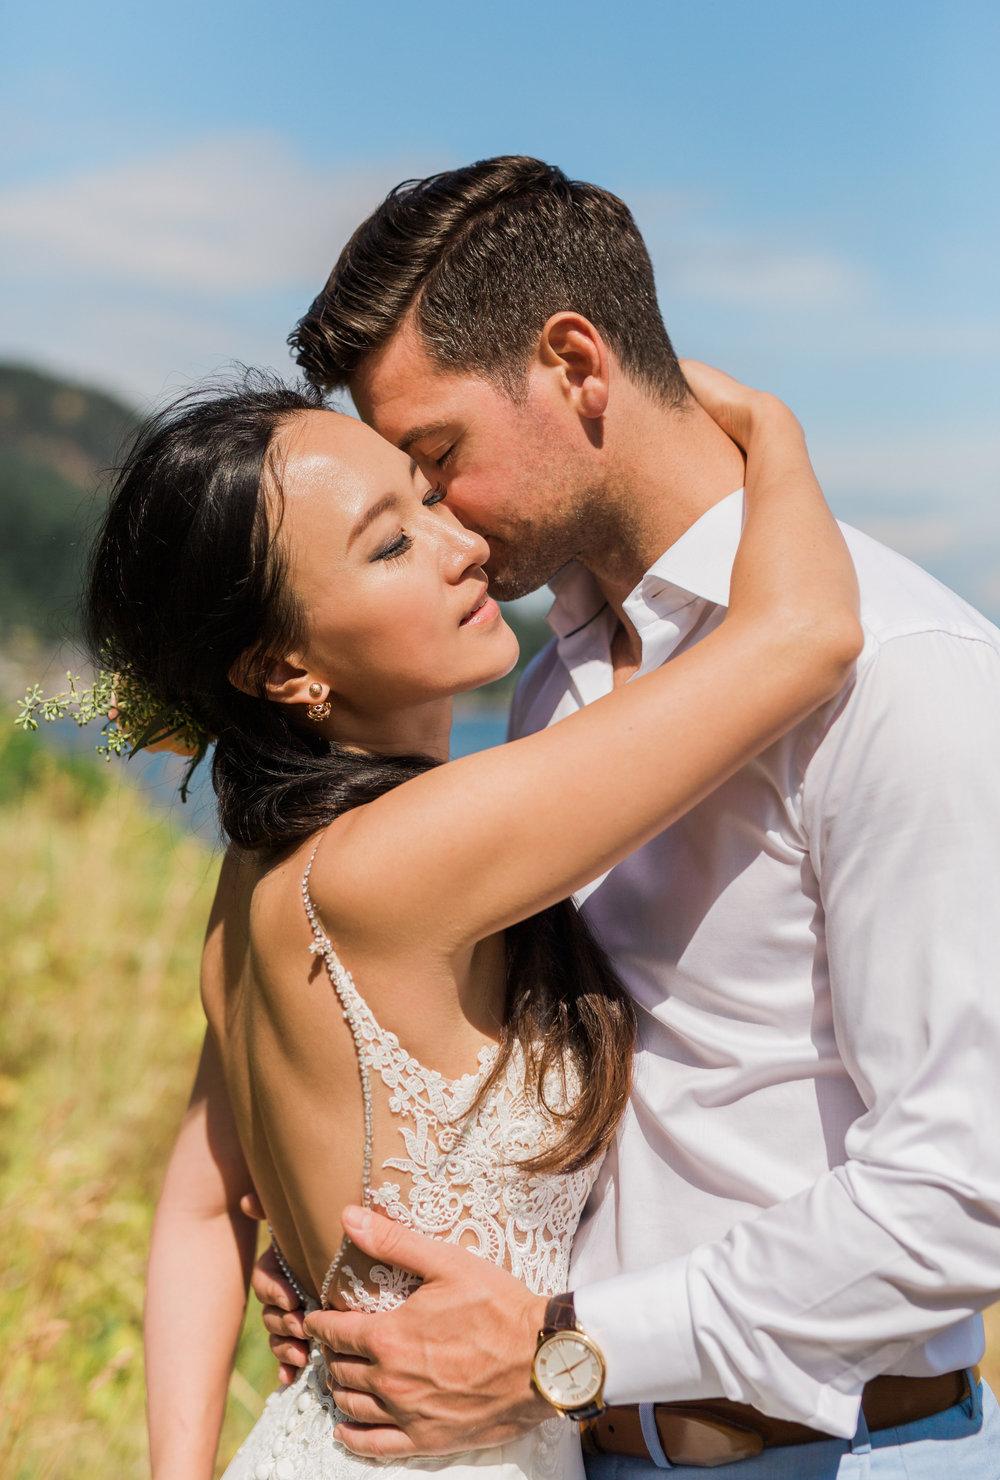 Gibsons Wedding Photos - Sunshine Coast Wedding Photos - Vancouver Wedding Photographer & Videographer - Sunshine Coast Wedding Photos - Sunshine Coast Wedding Photographer - Jennifer Picard Photography - IMG_9888.jpg